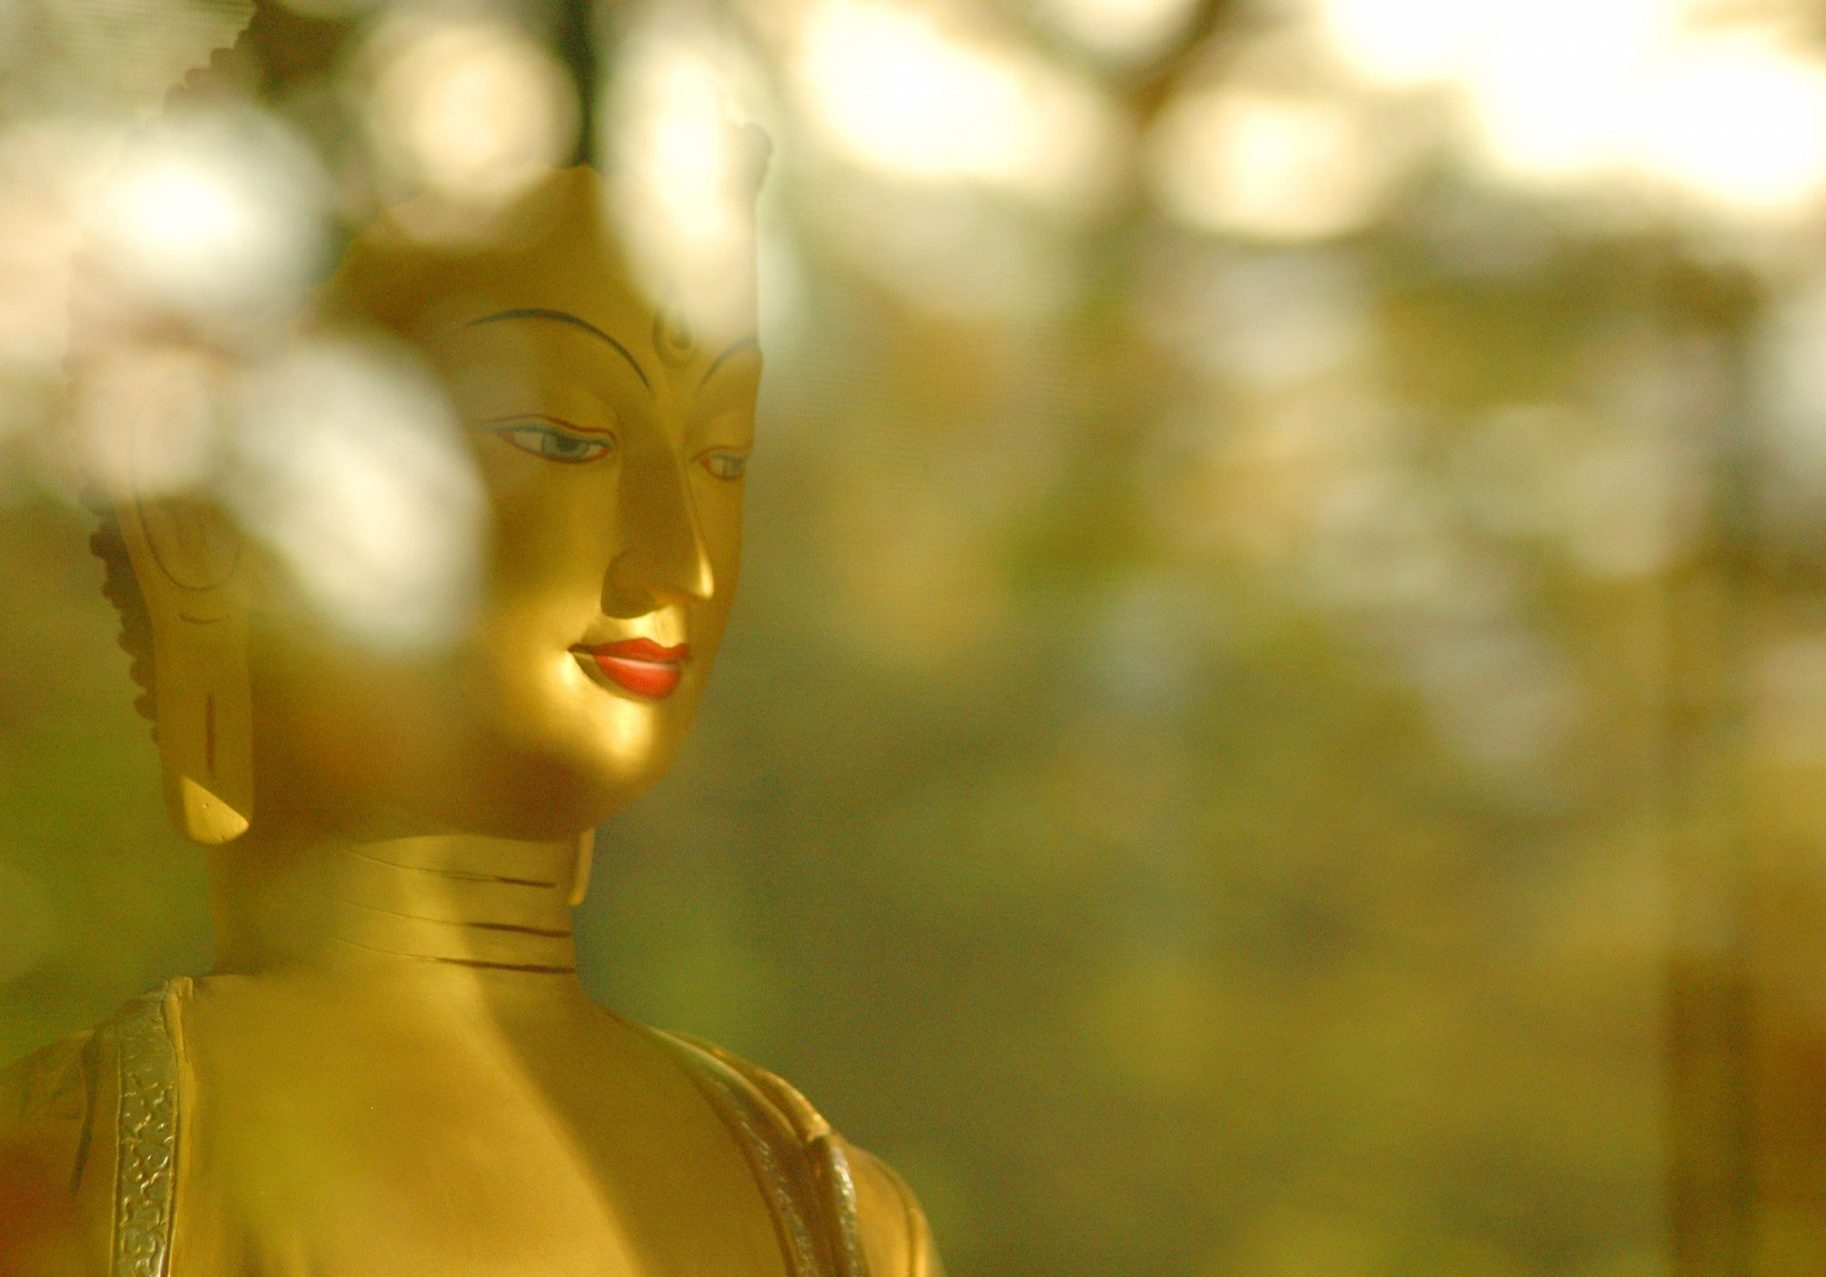 Buddha-Shakyamuni-With-Light-And-Shadows-ASSETkyd3a2dn3bbvag-scaled